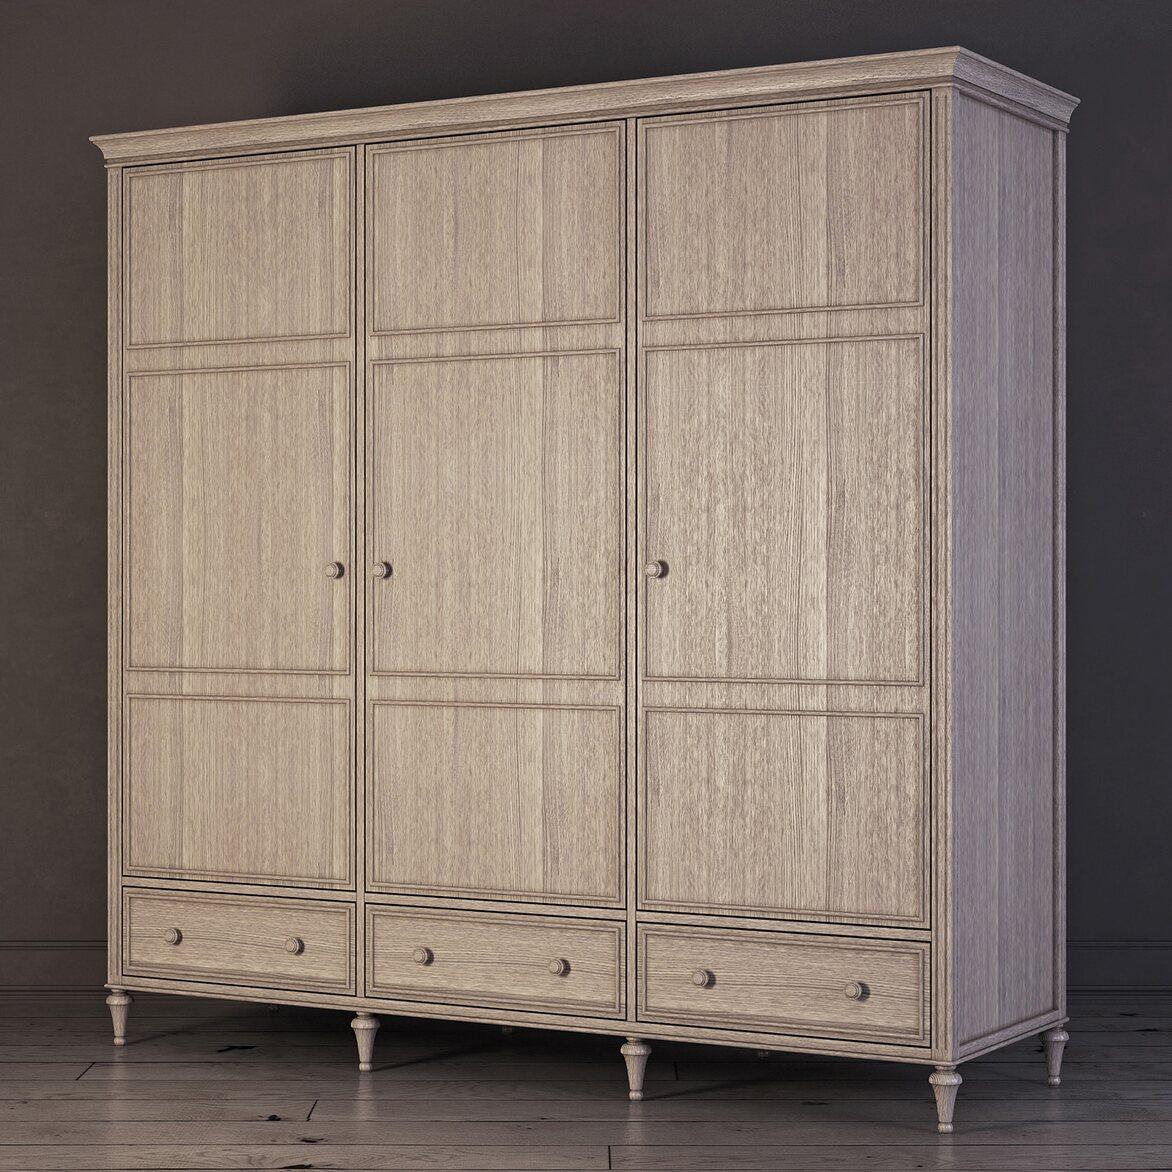 Шкаф трехстворчатый Riverdi, светлый дуб 2 | Платяные шкафы Kingsby